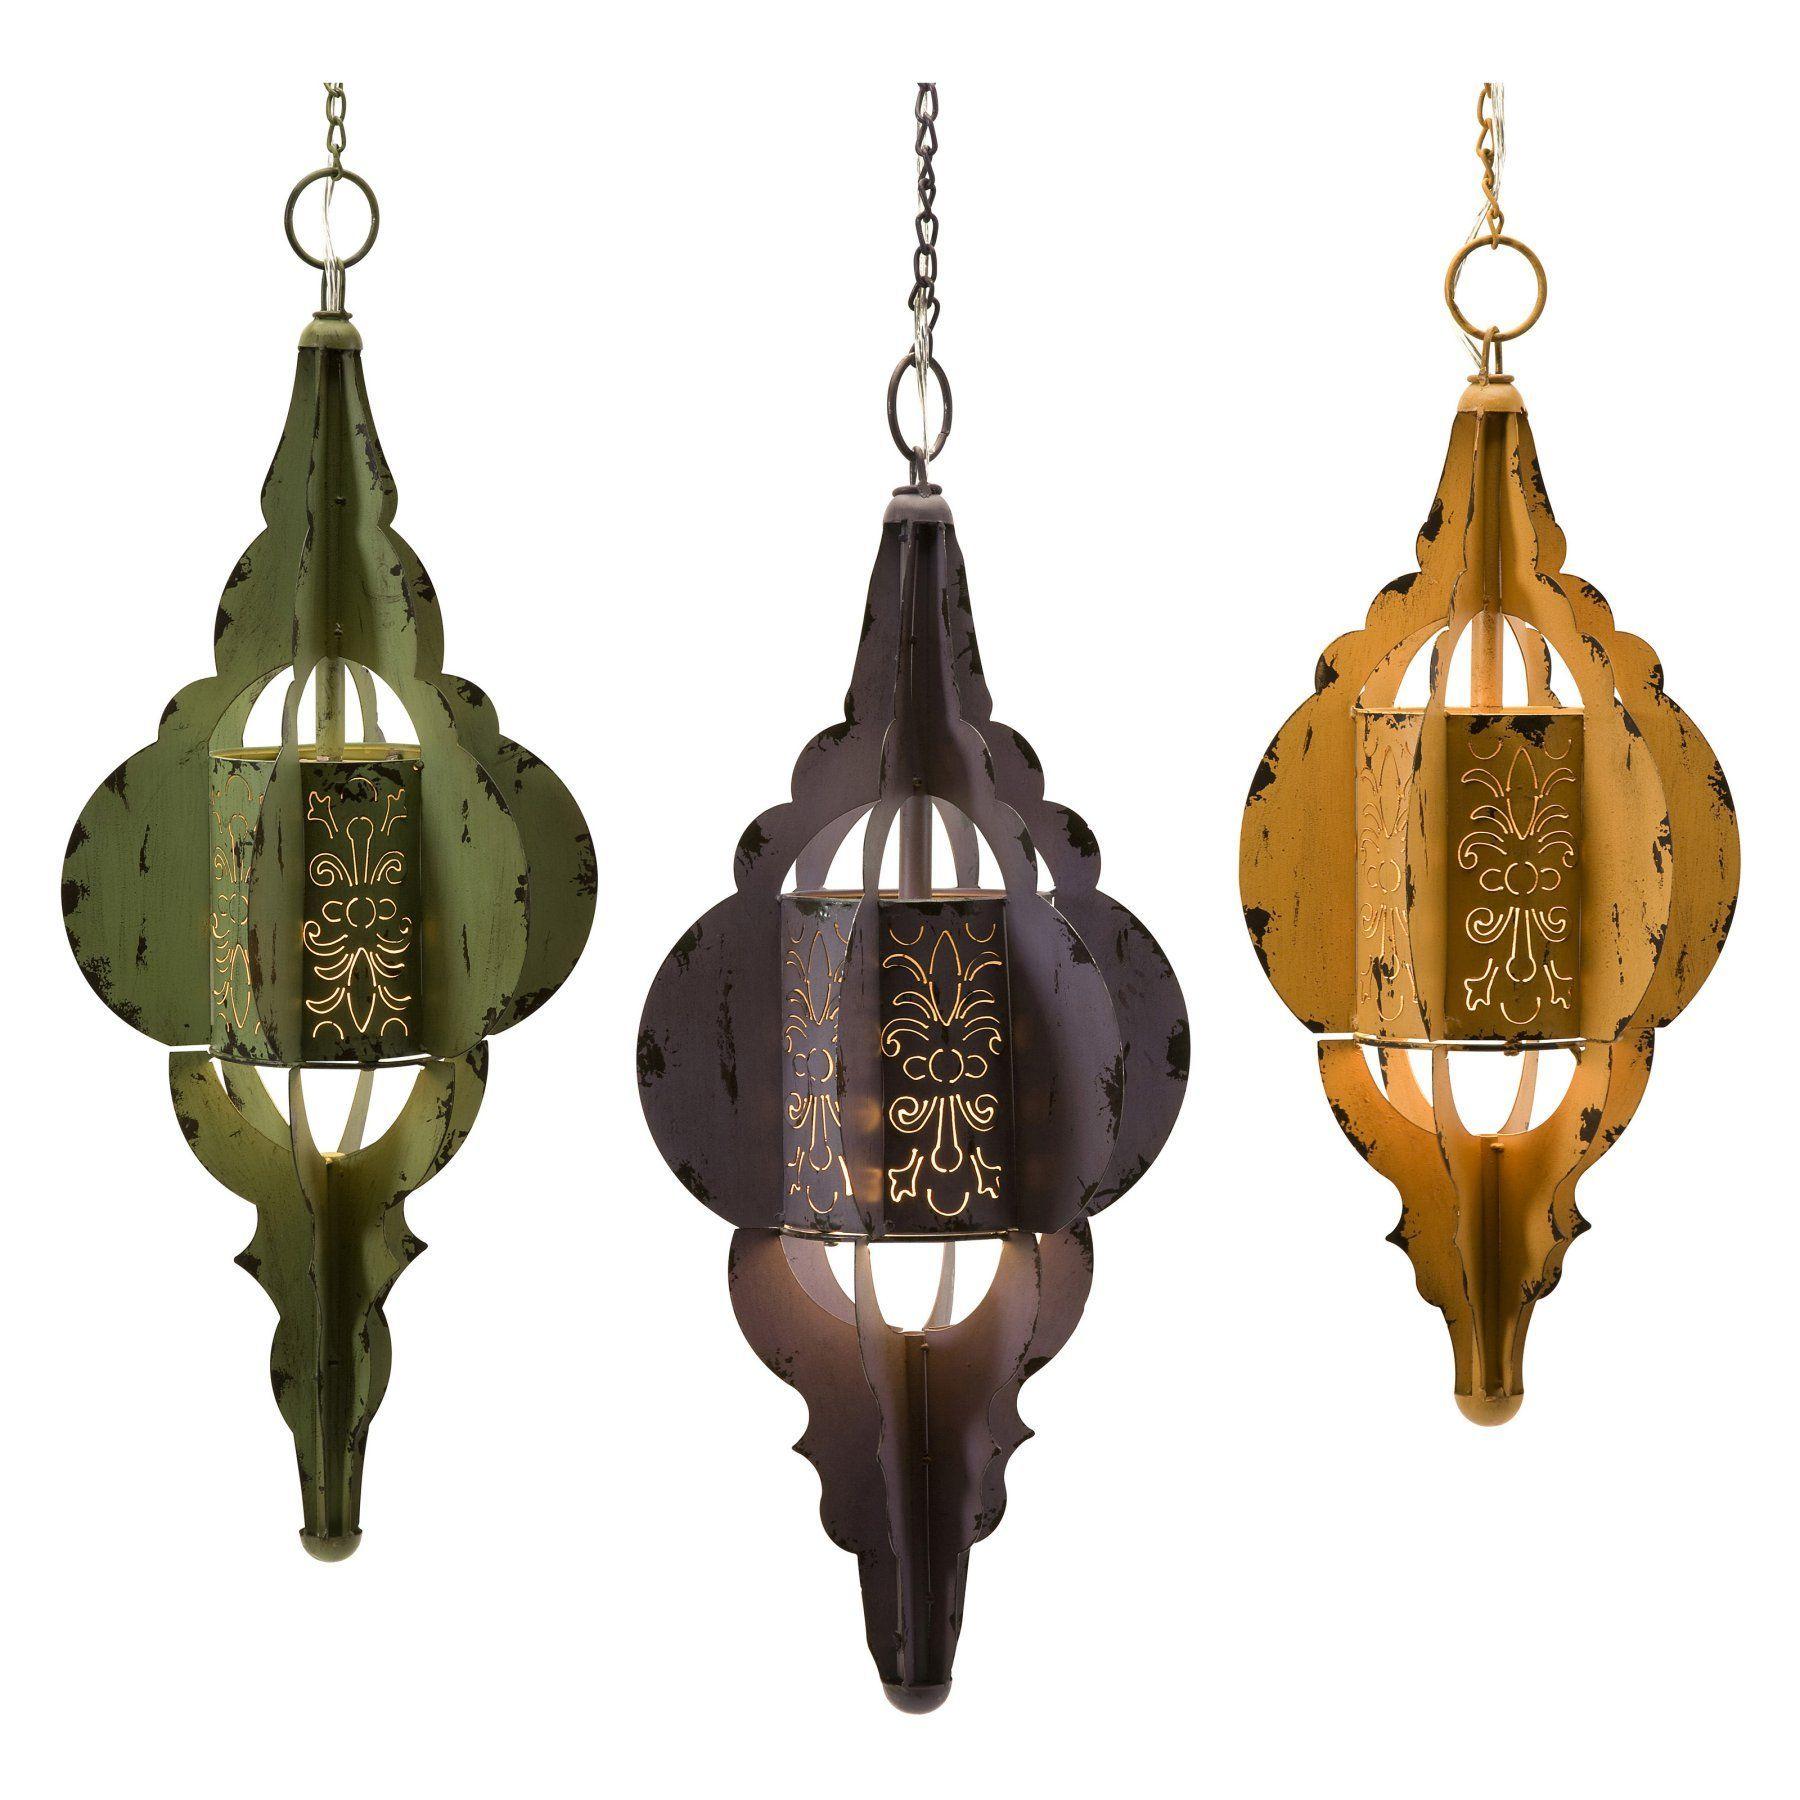 Imax georgette pendant light set of pendants